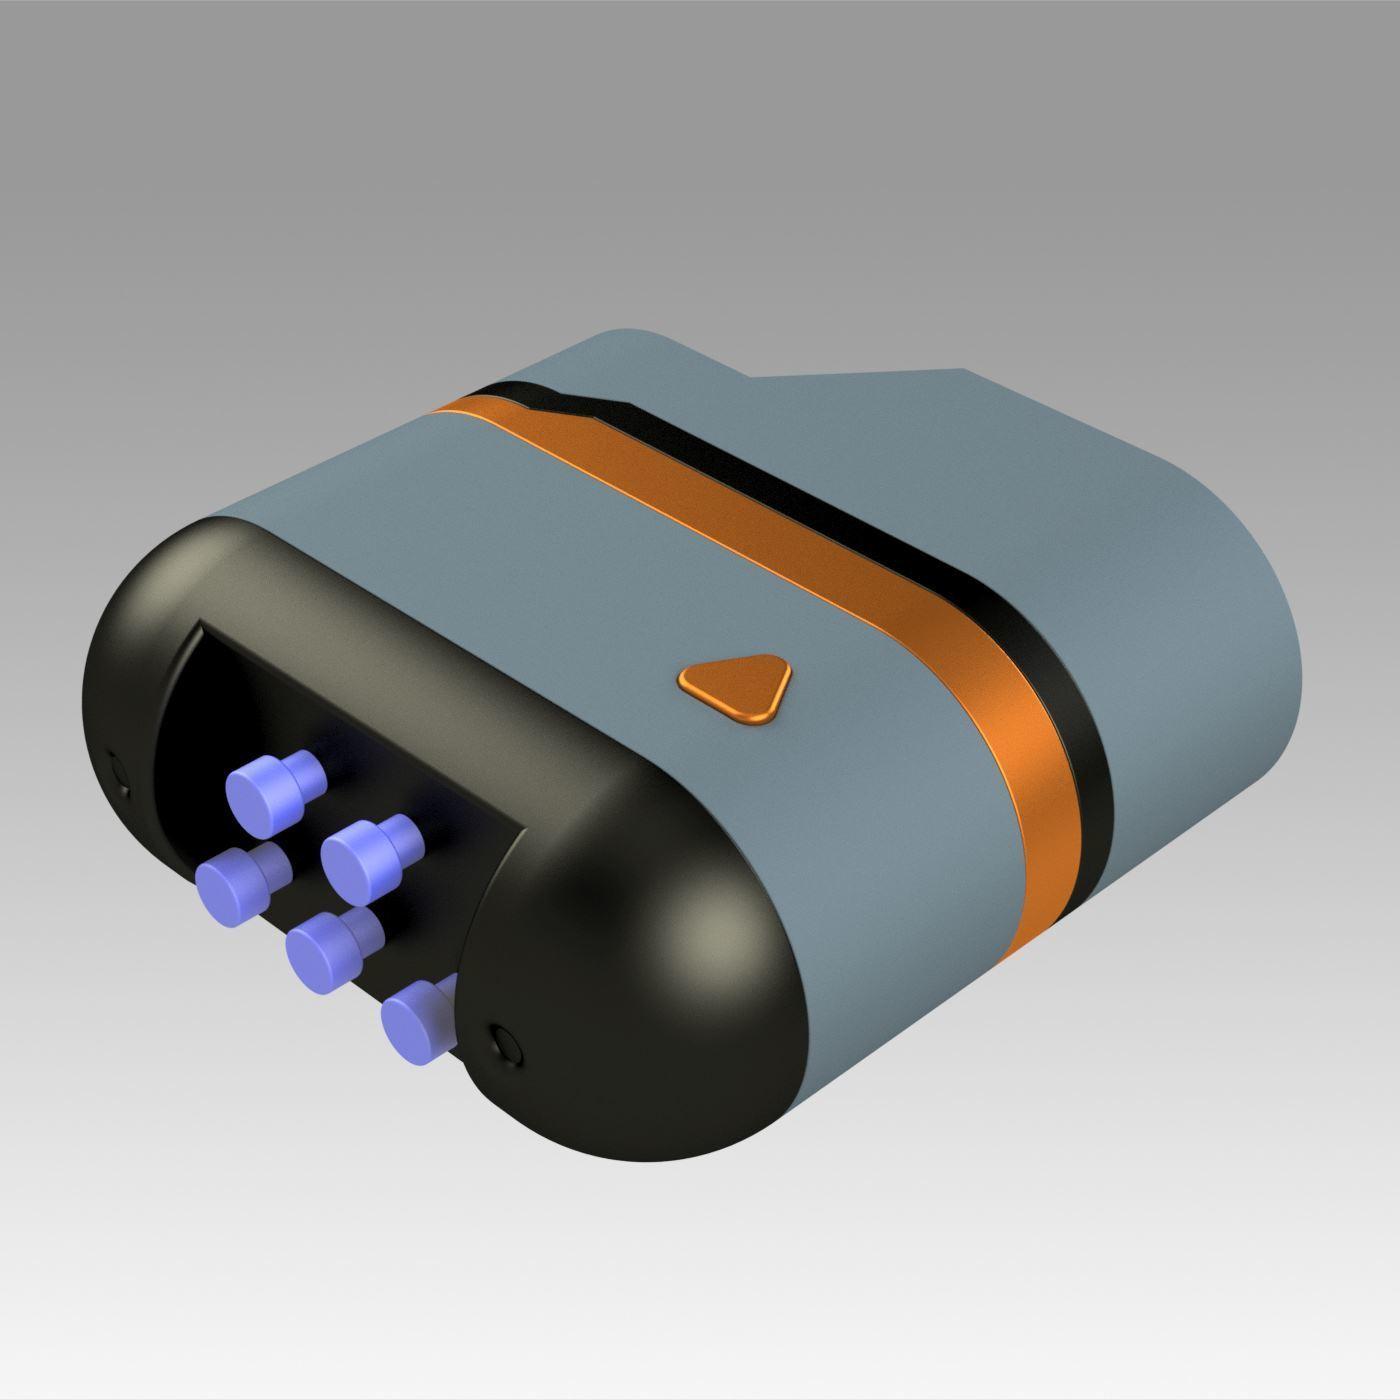 6.jpg Download OBJ file Star Trek Prop Dr Phlox Scanner replica prop cosplay • 3D printer object, Blackeveryday